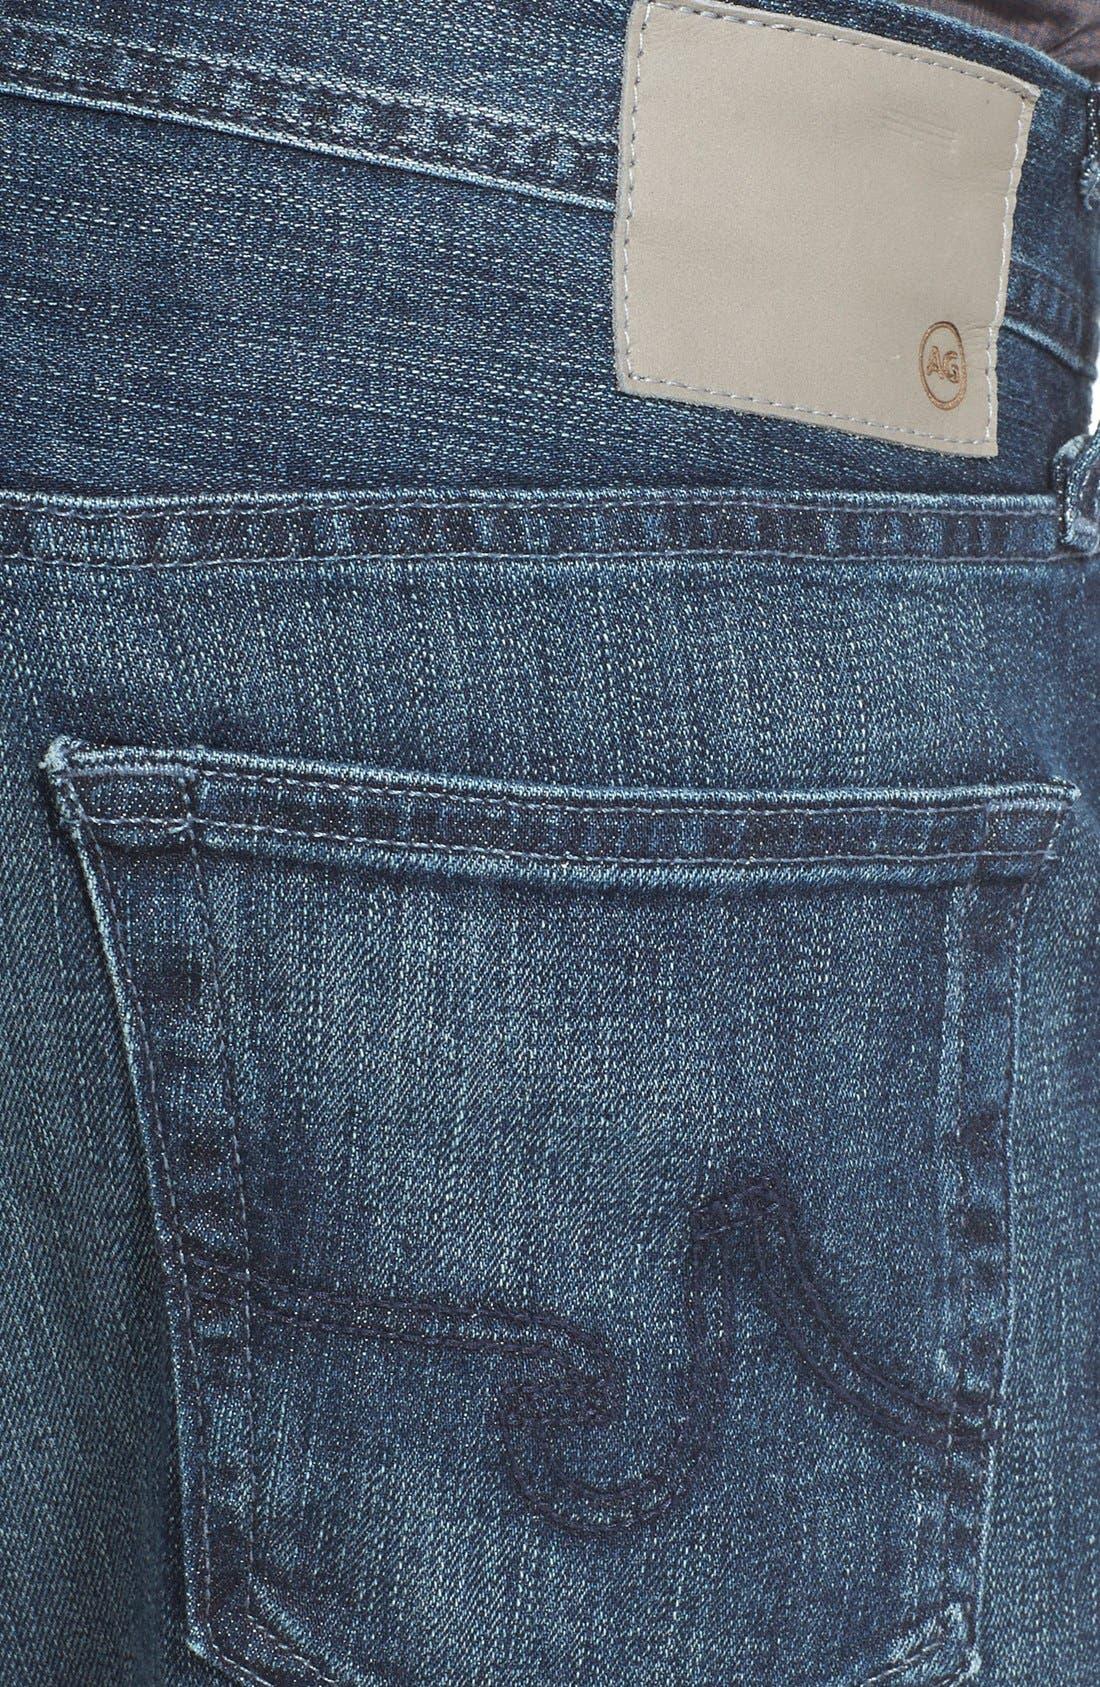 'Graduate' Slim Straight Leg Jeans,                             Alternate thumbnail 4, color,                             Stallow